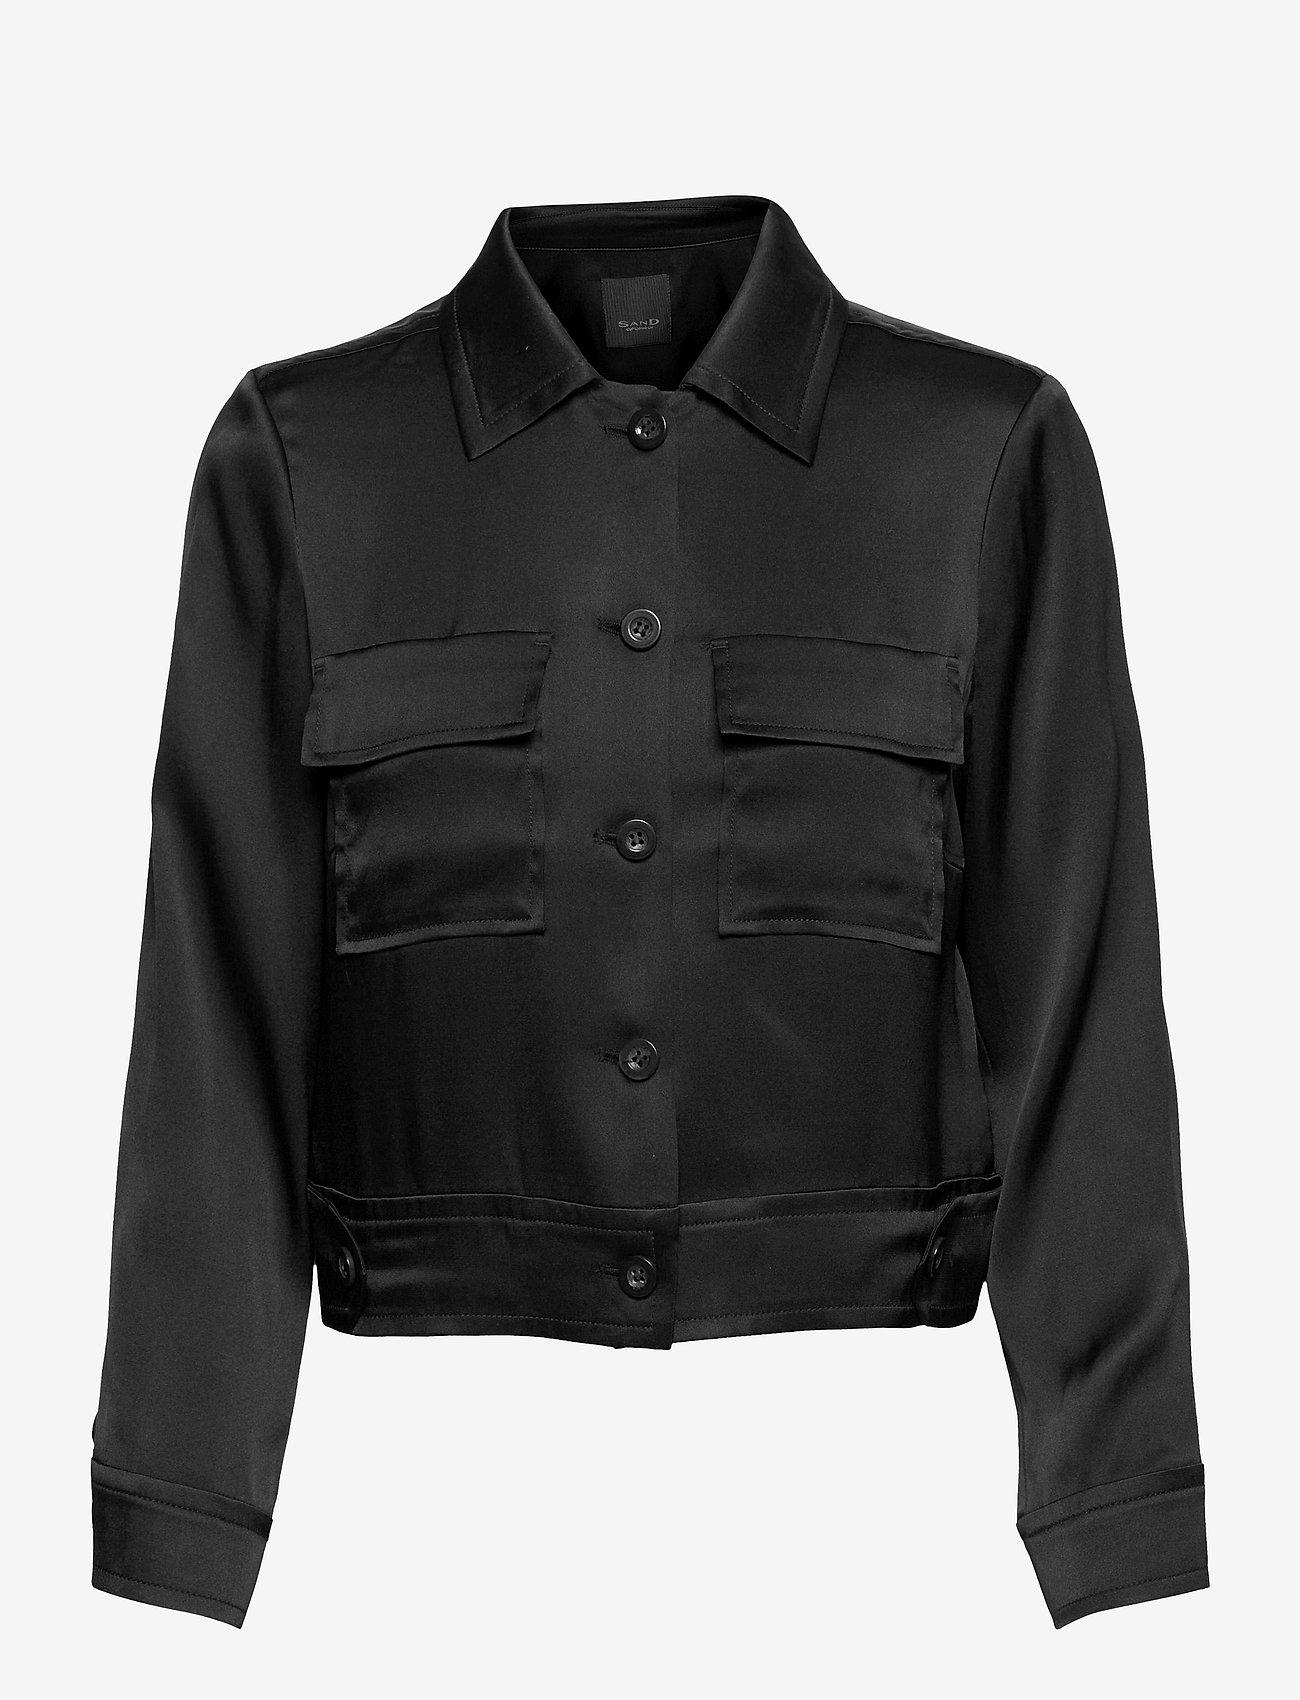 SAND - Double Silk - Kaela - lichte jassen - black - 0